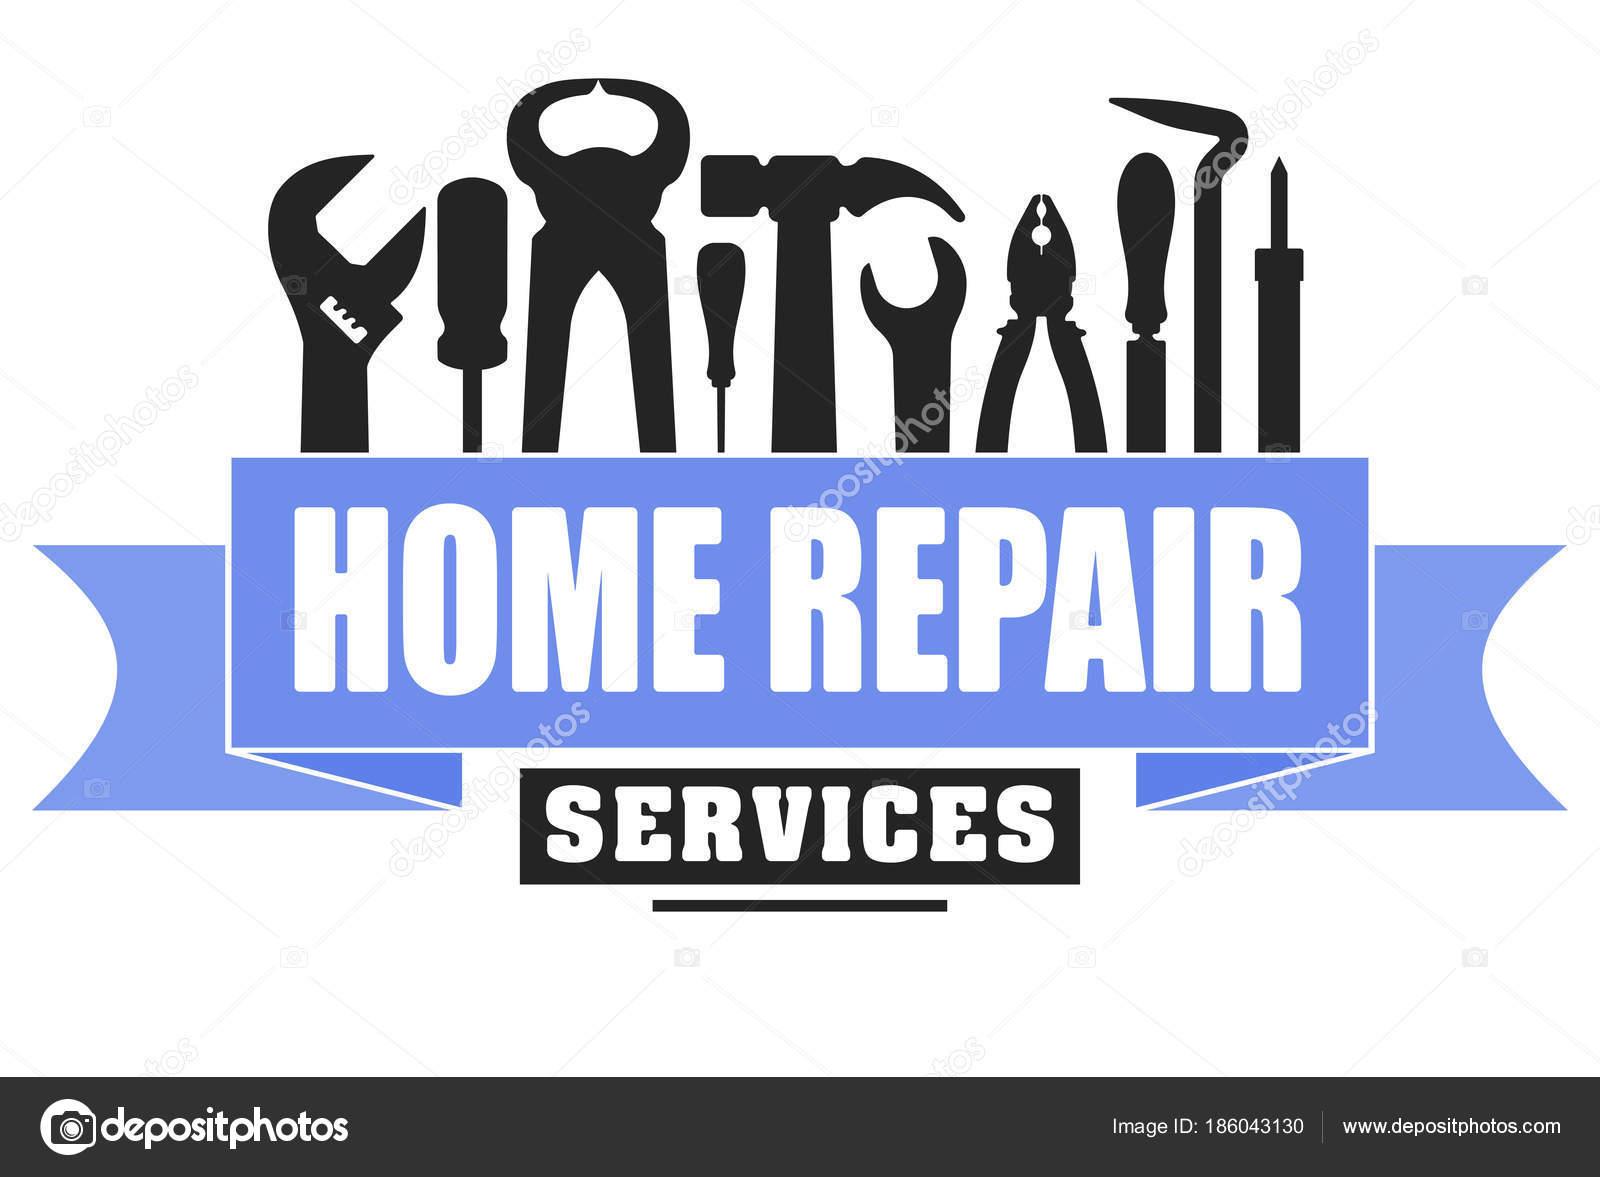 Home Repair Services Logo Stock Vector C Antonshpak 186043130